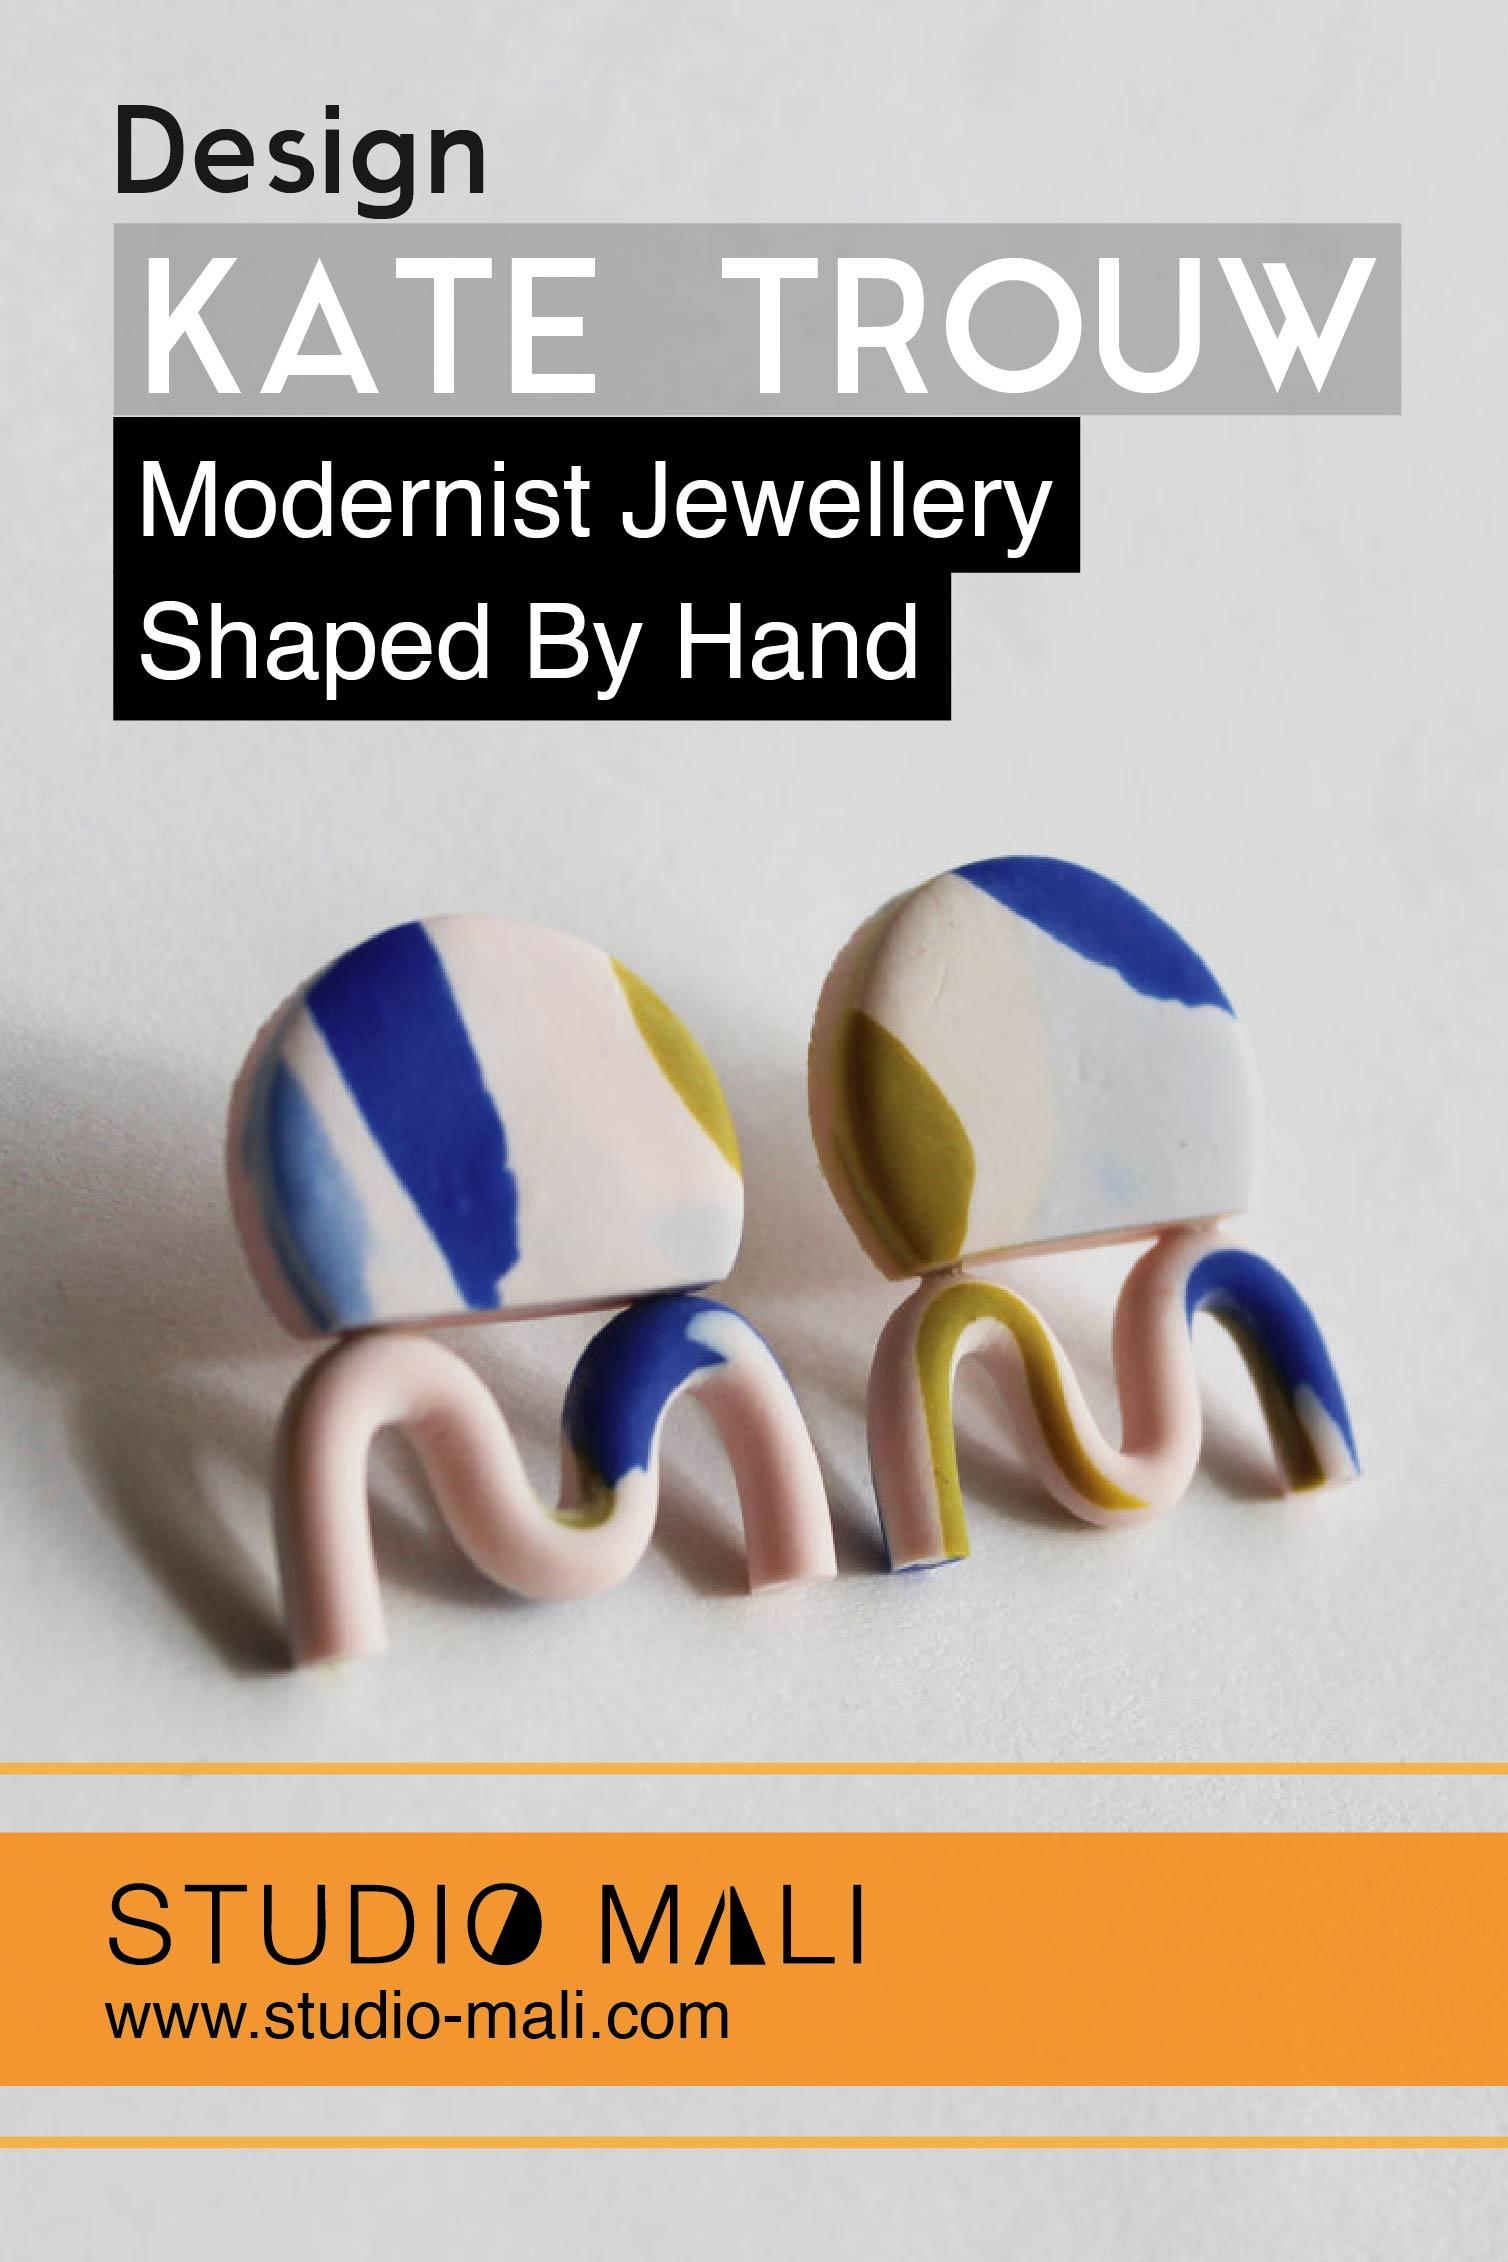 Kate Trouw - Modernist Jewellery Shaped By Hand.jpg